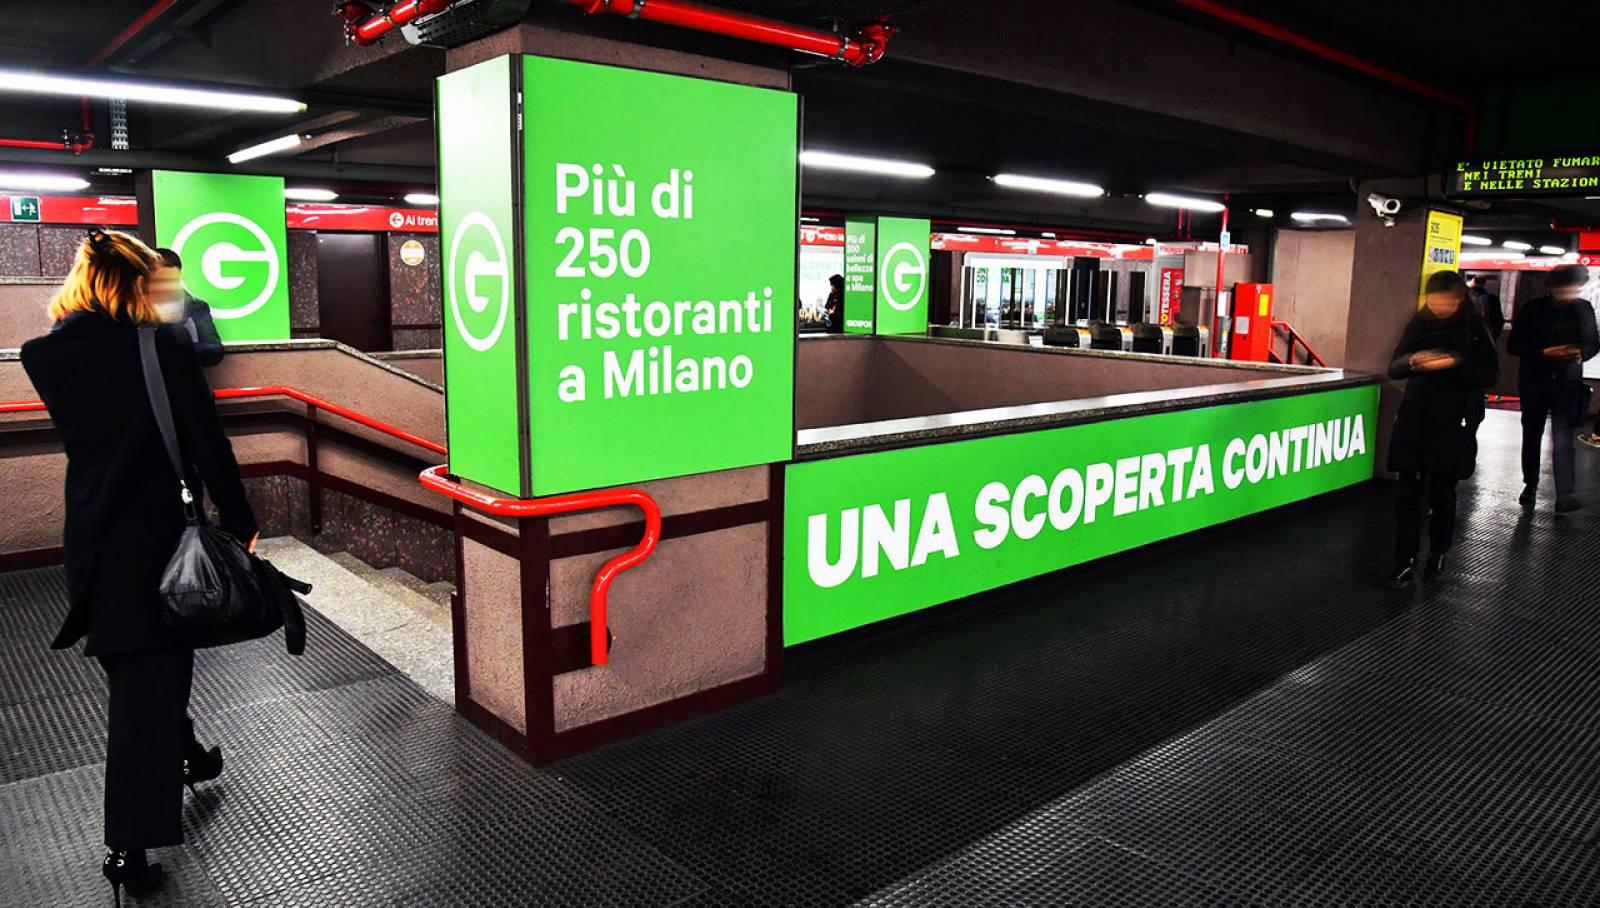 Pubblicità in metropolitana IGPDecaux Milano Station Domination per Groupon